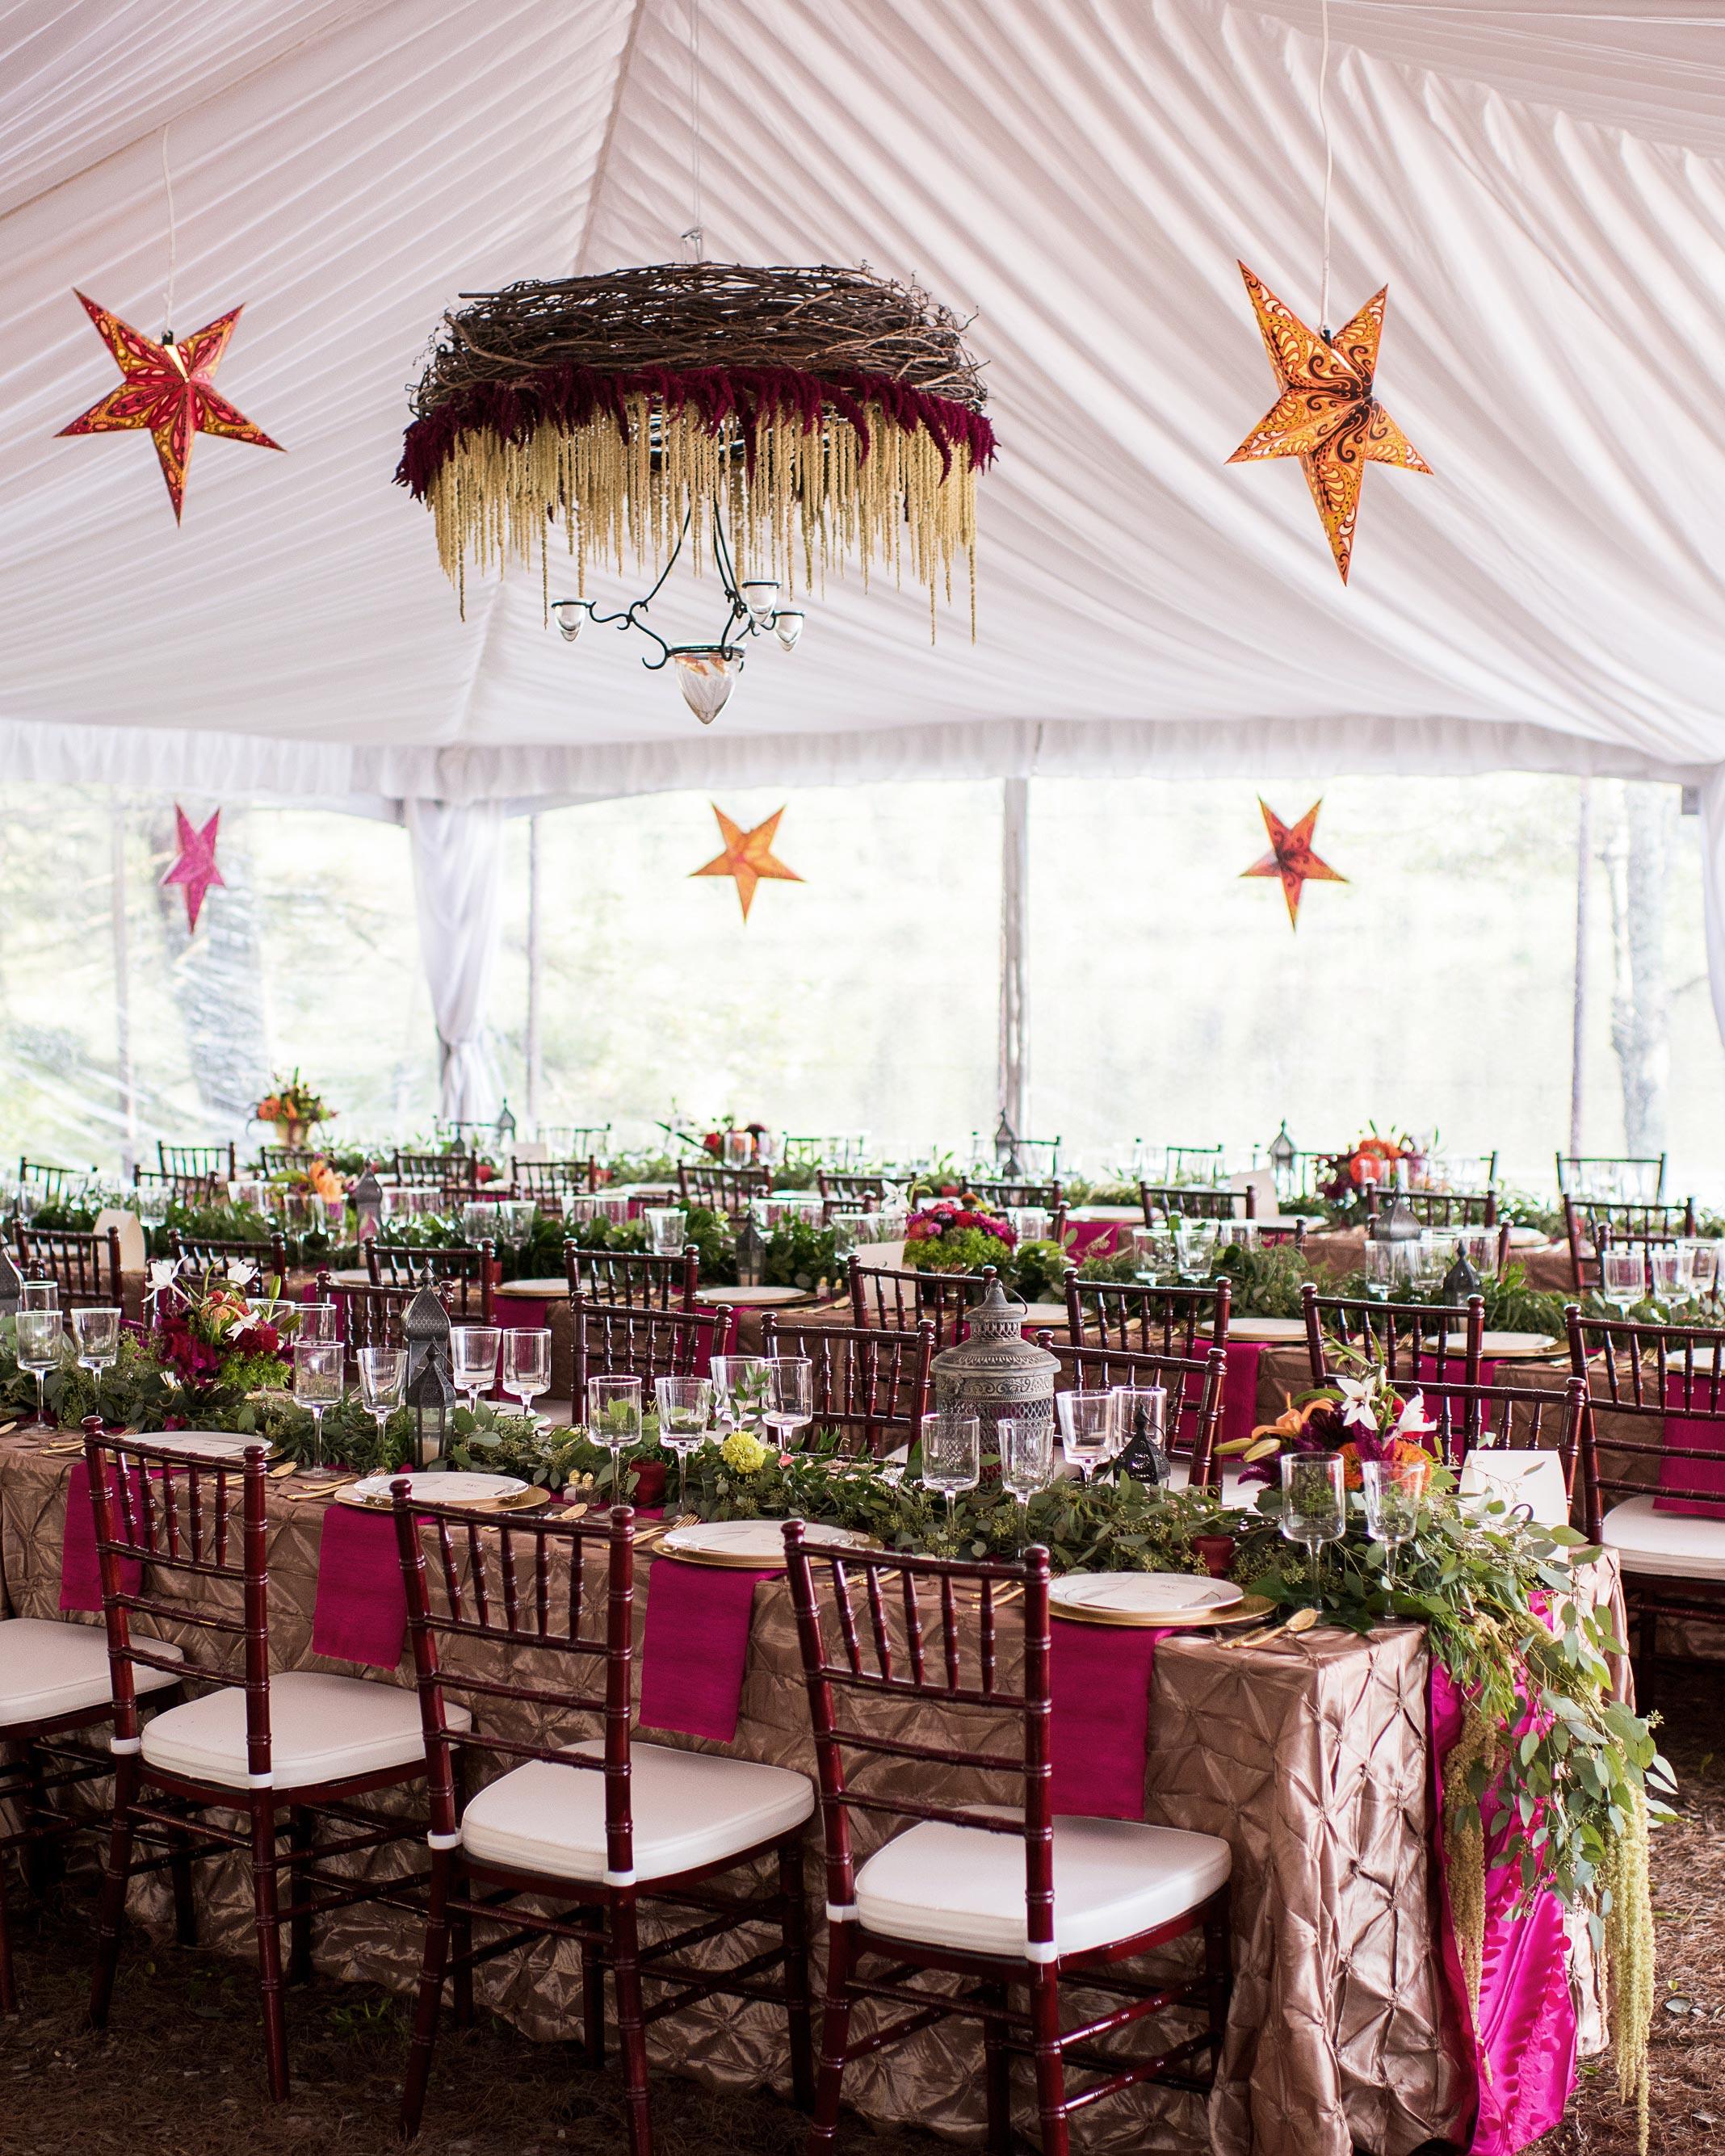 christopher-stephen-wedding-tent-0473-s112787-0416.jpg